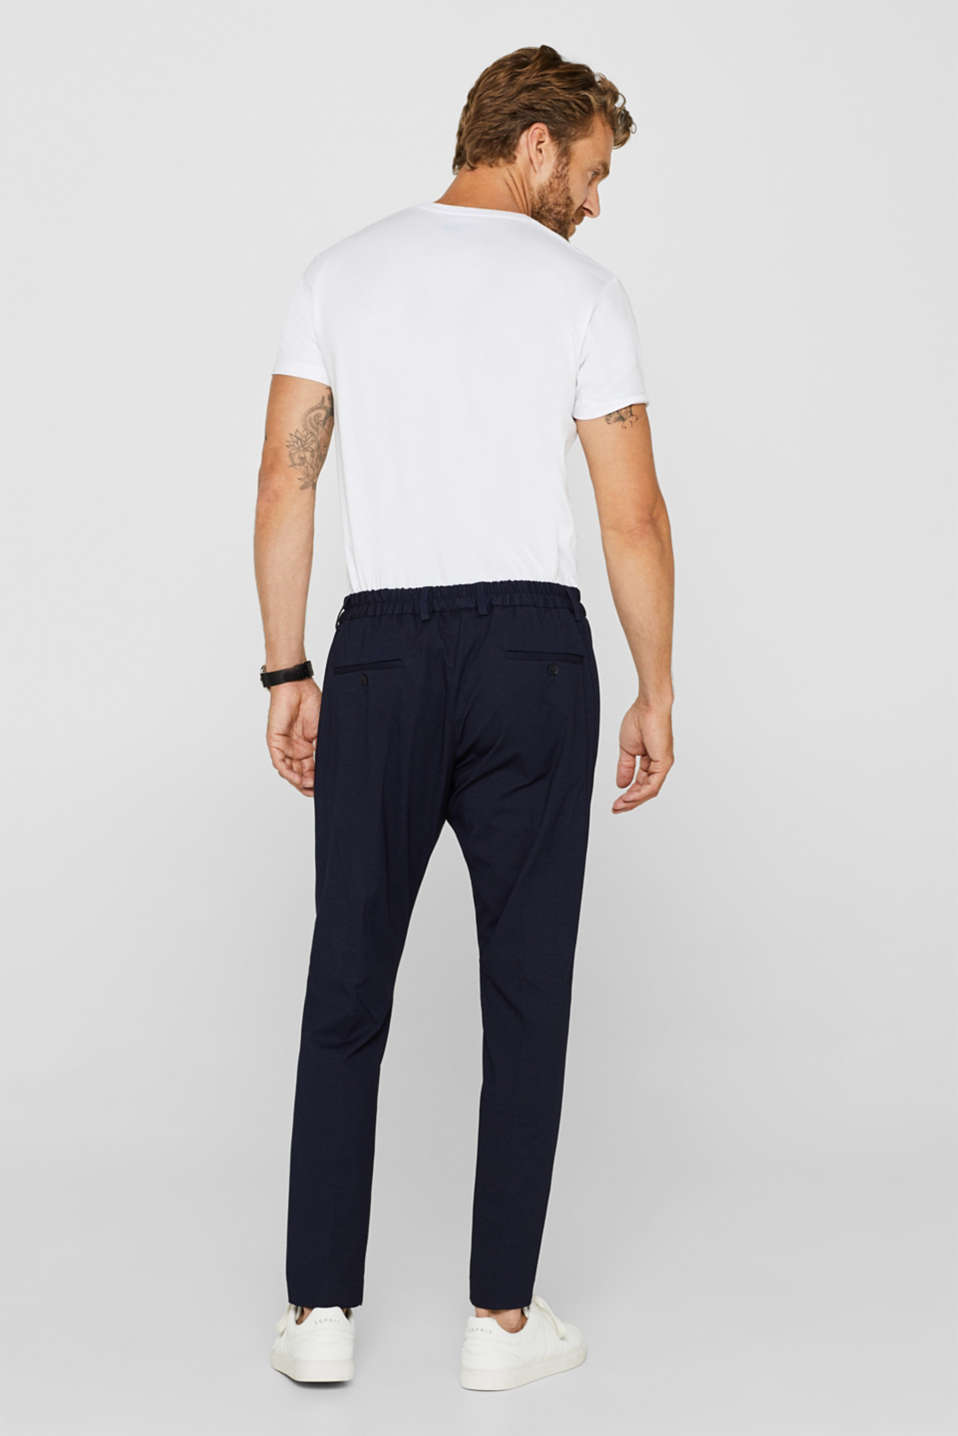 Pants suit, NAVY, detail image number 1